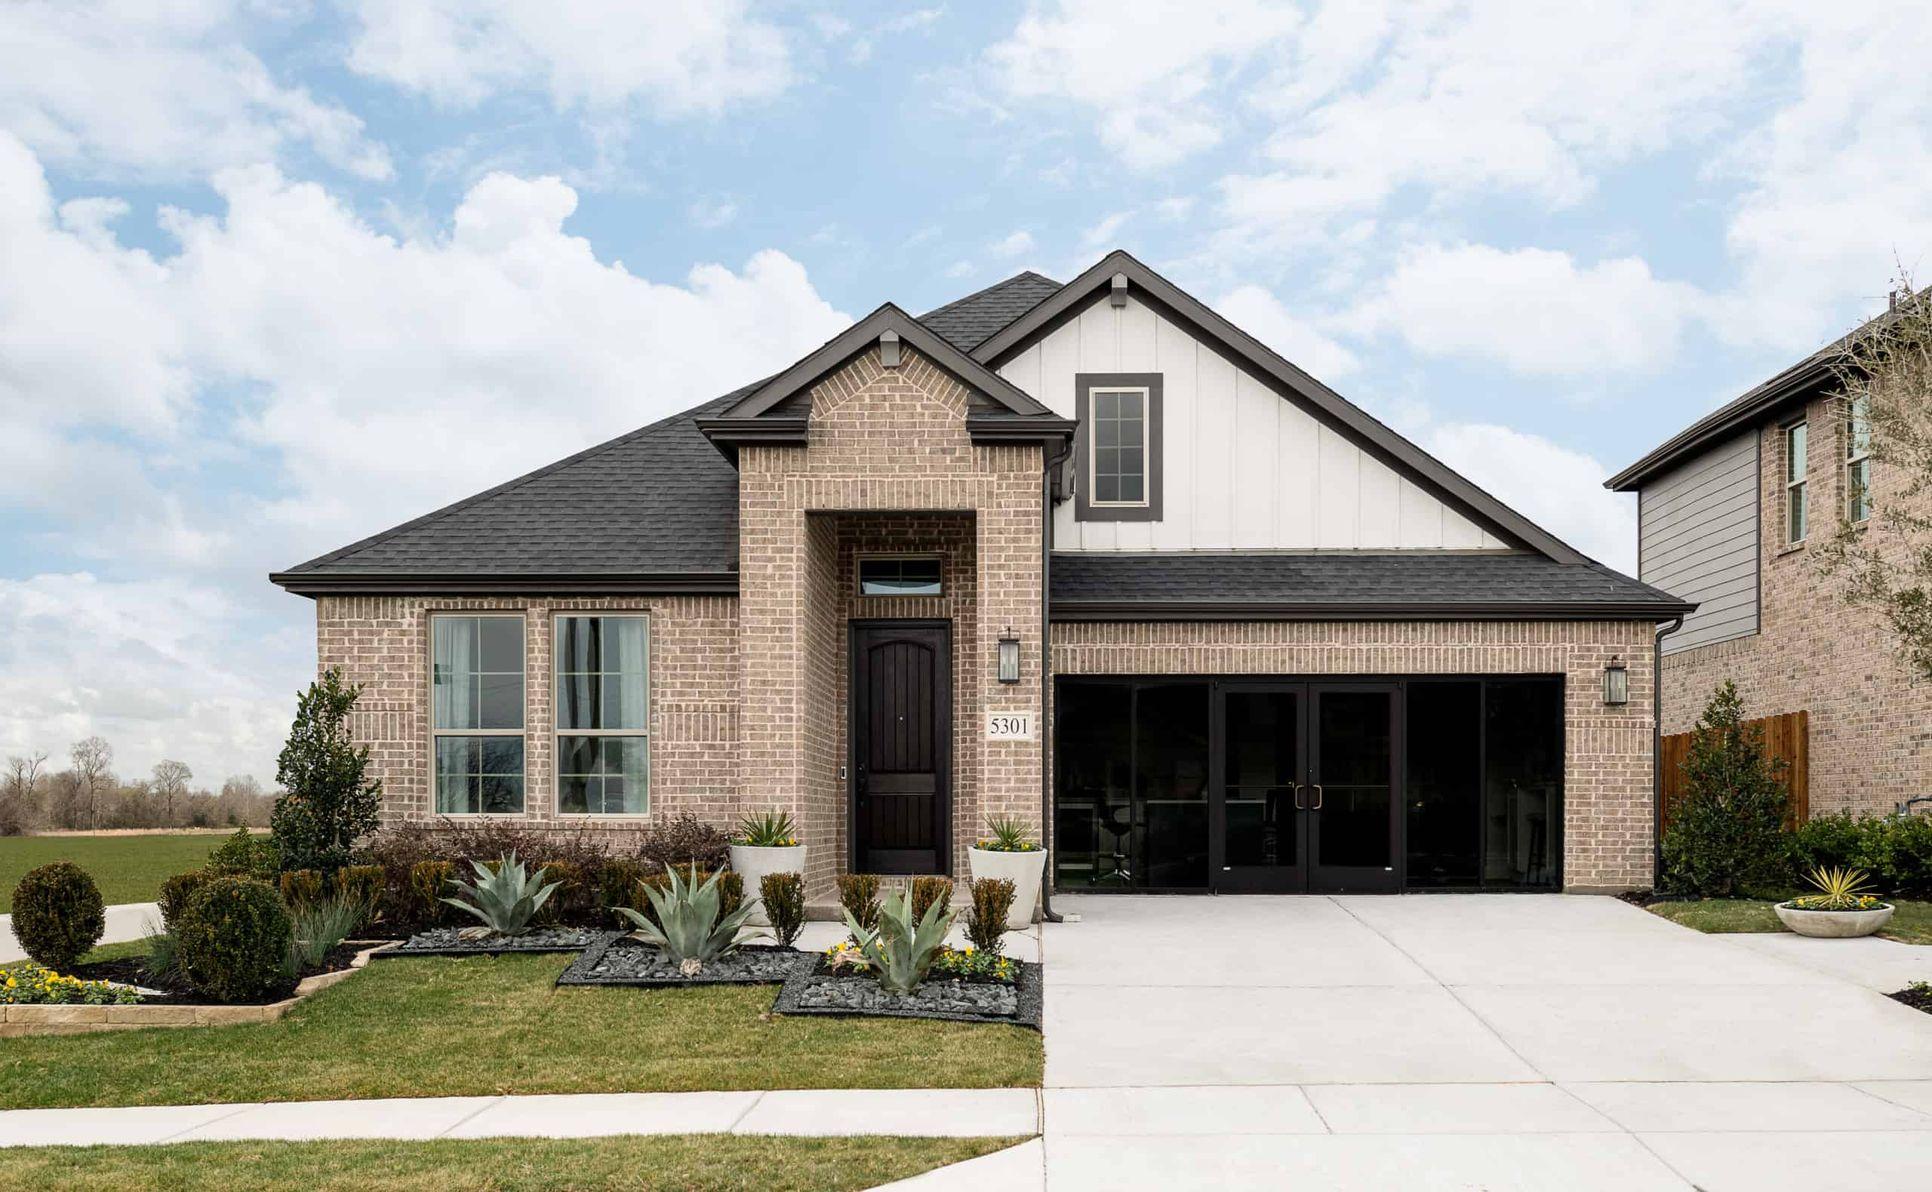 Exterior:Madison Model Home